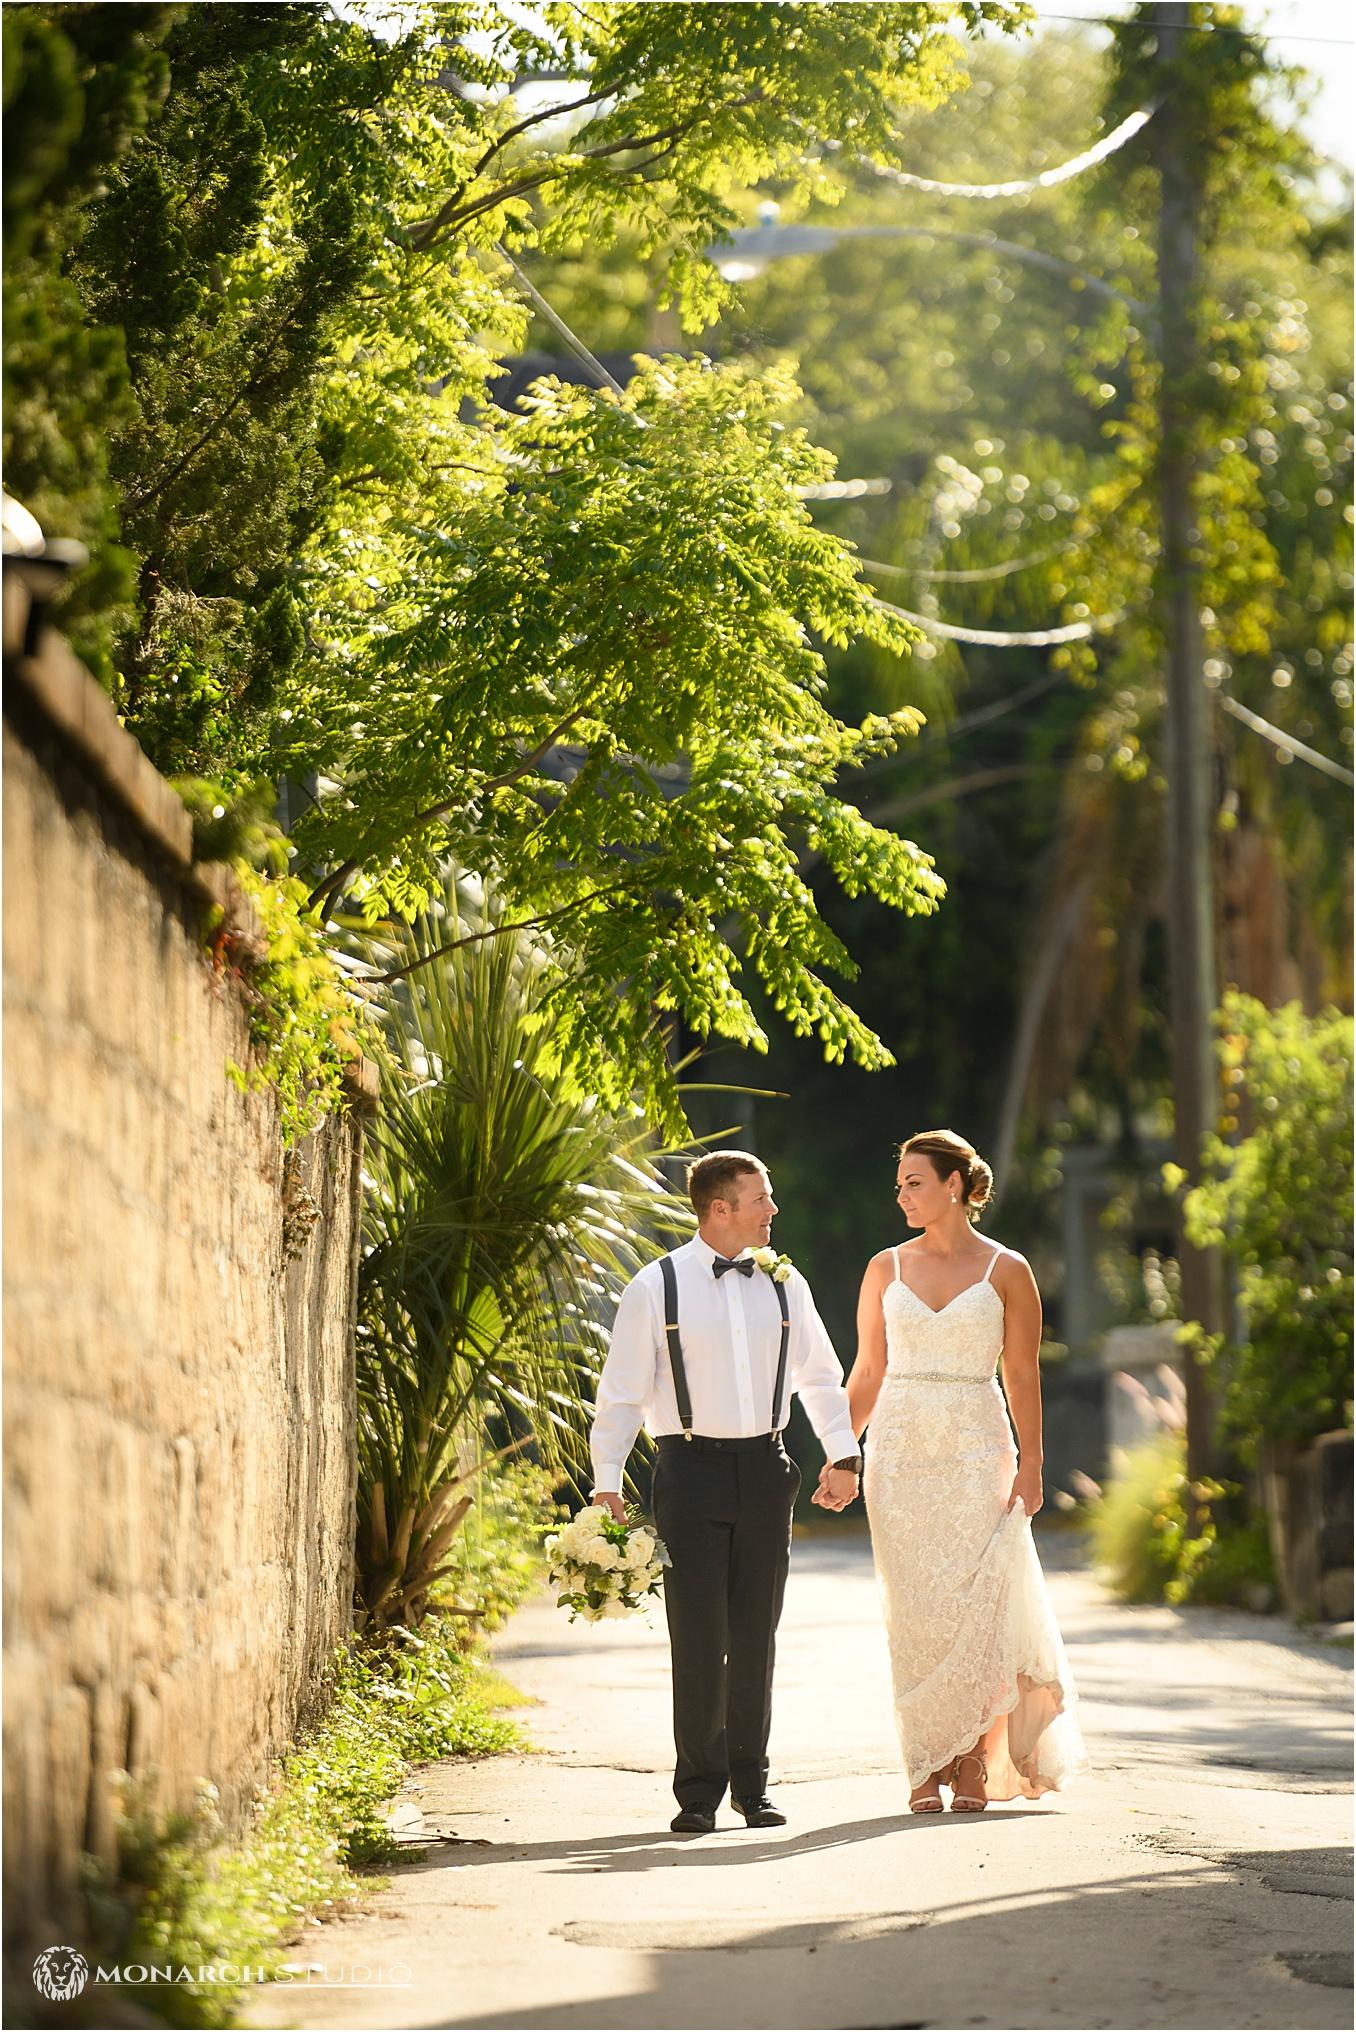 052-whiteroom-wedding-photographer-2019-05-22_0034.jpg